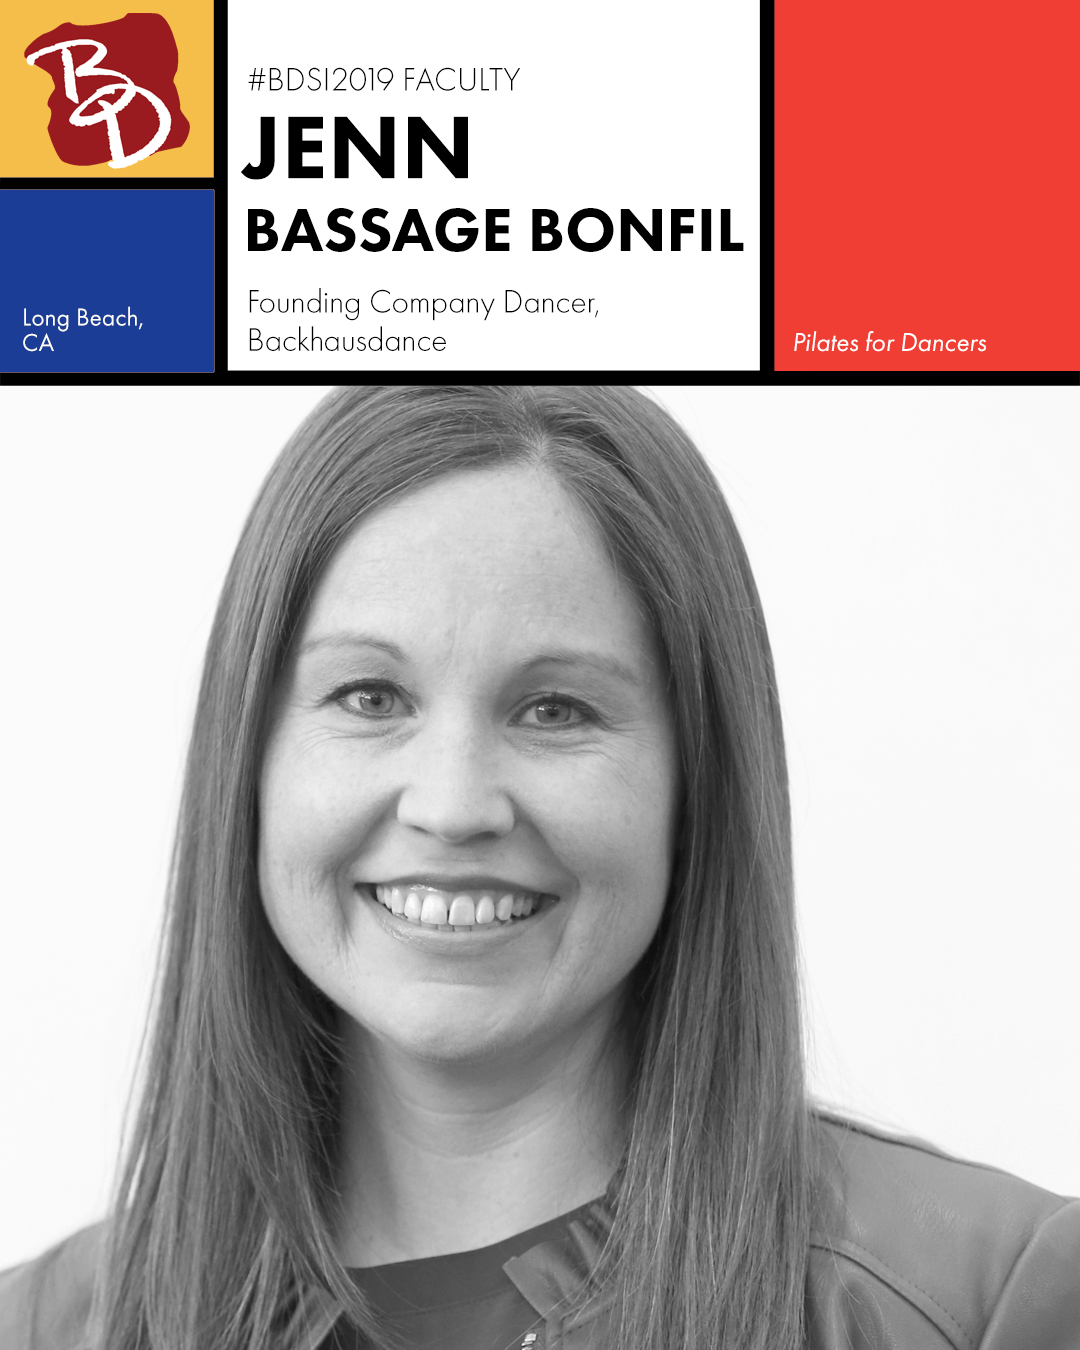 Faculty Announcement - Bassage Bonfil Jenn.jpg